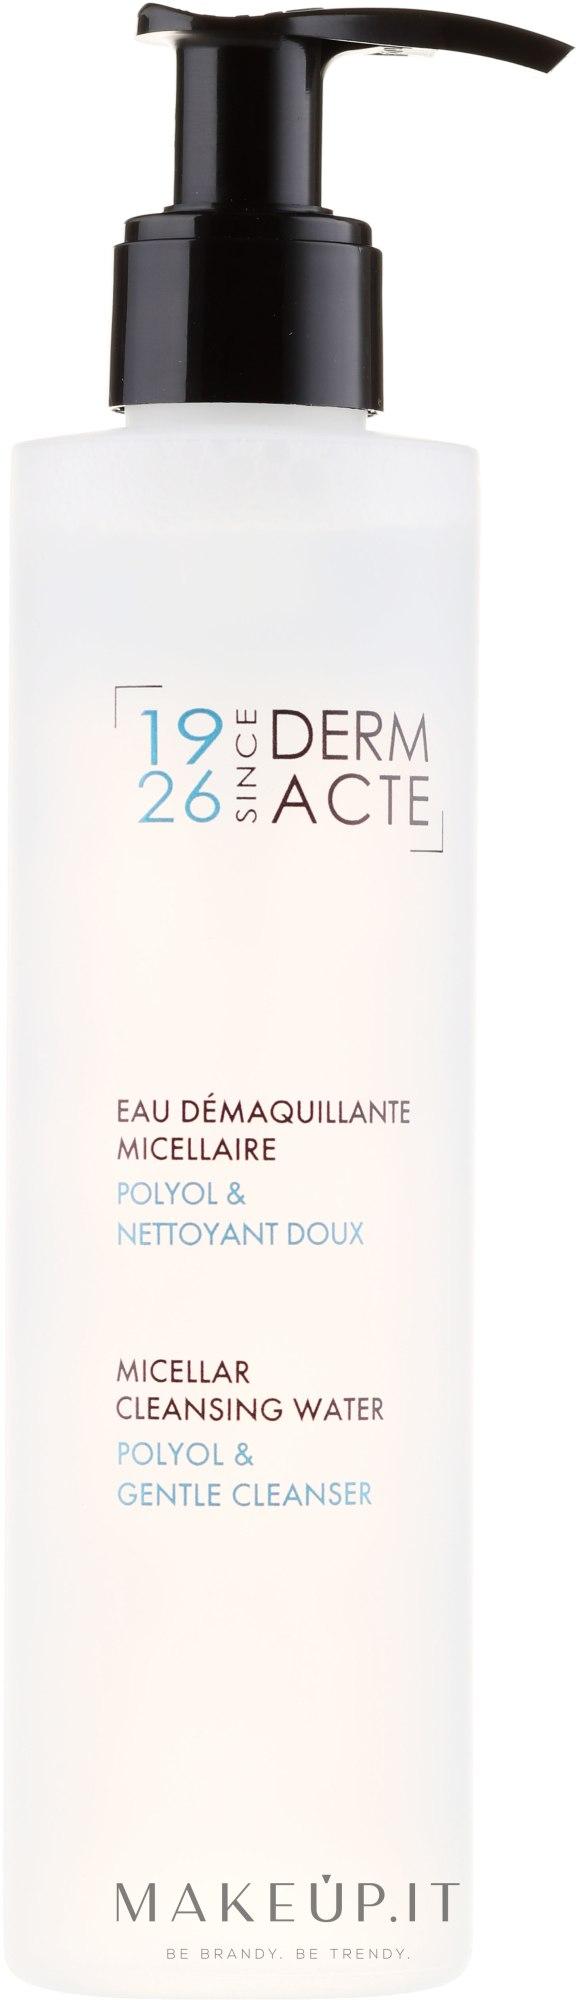 Acqua micellare struccante - Academie Derm Acte Micellar Water — foto 200 ml